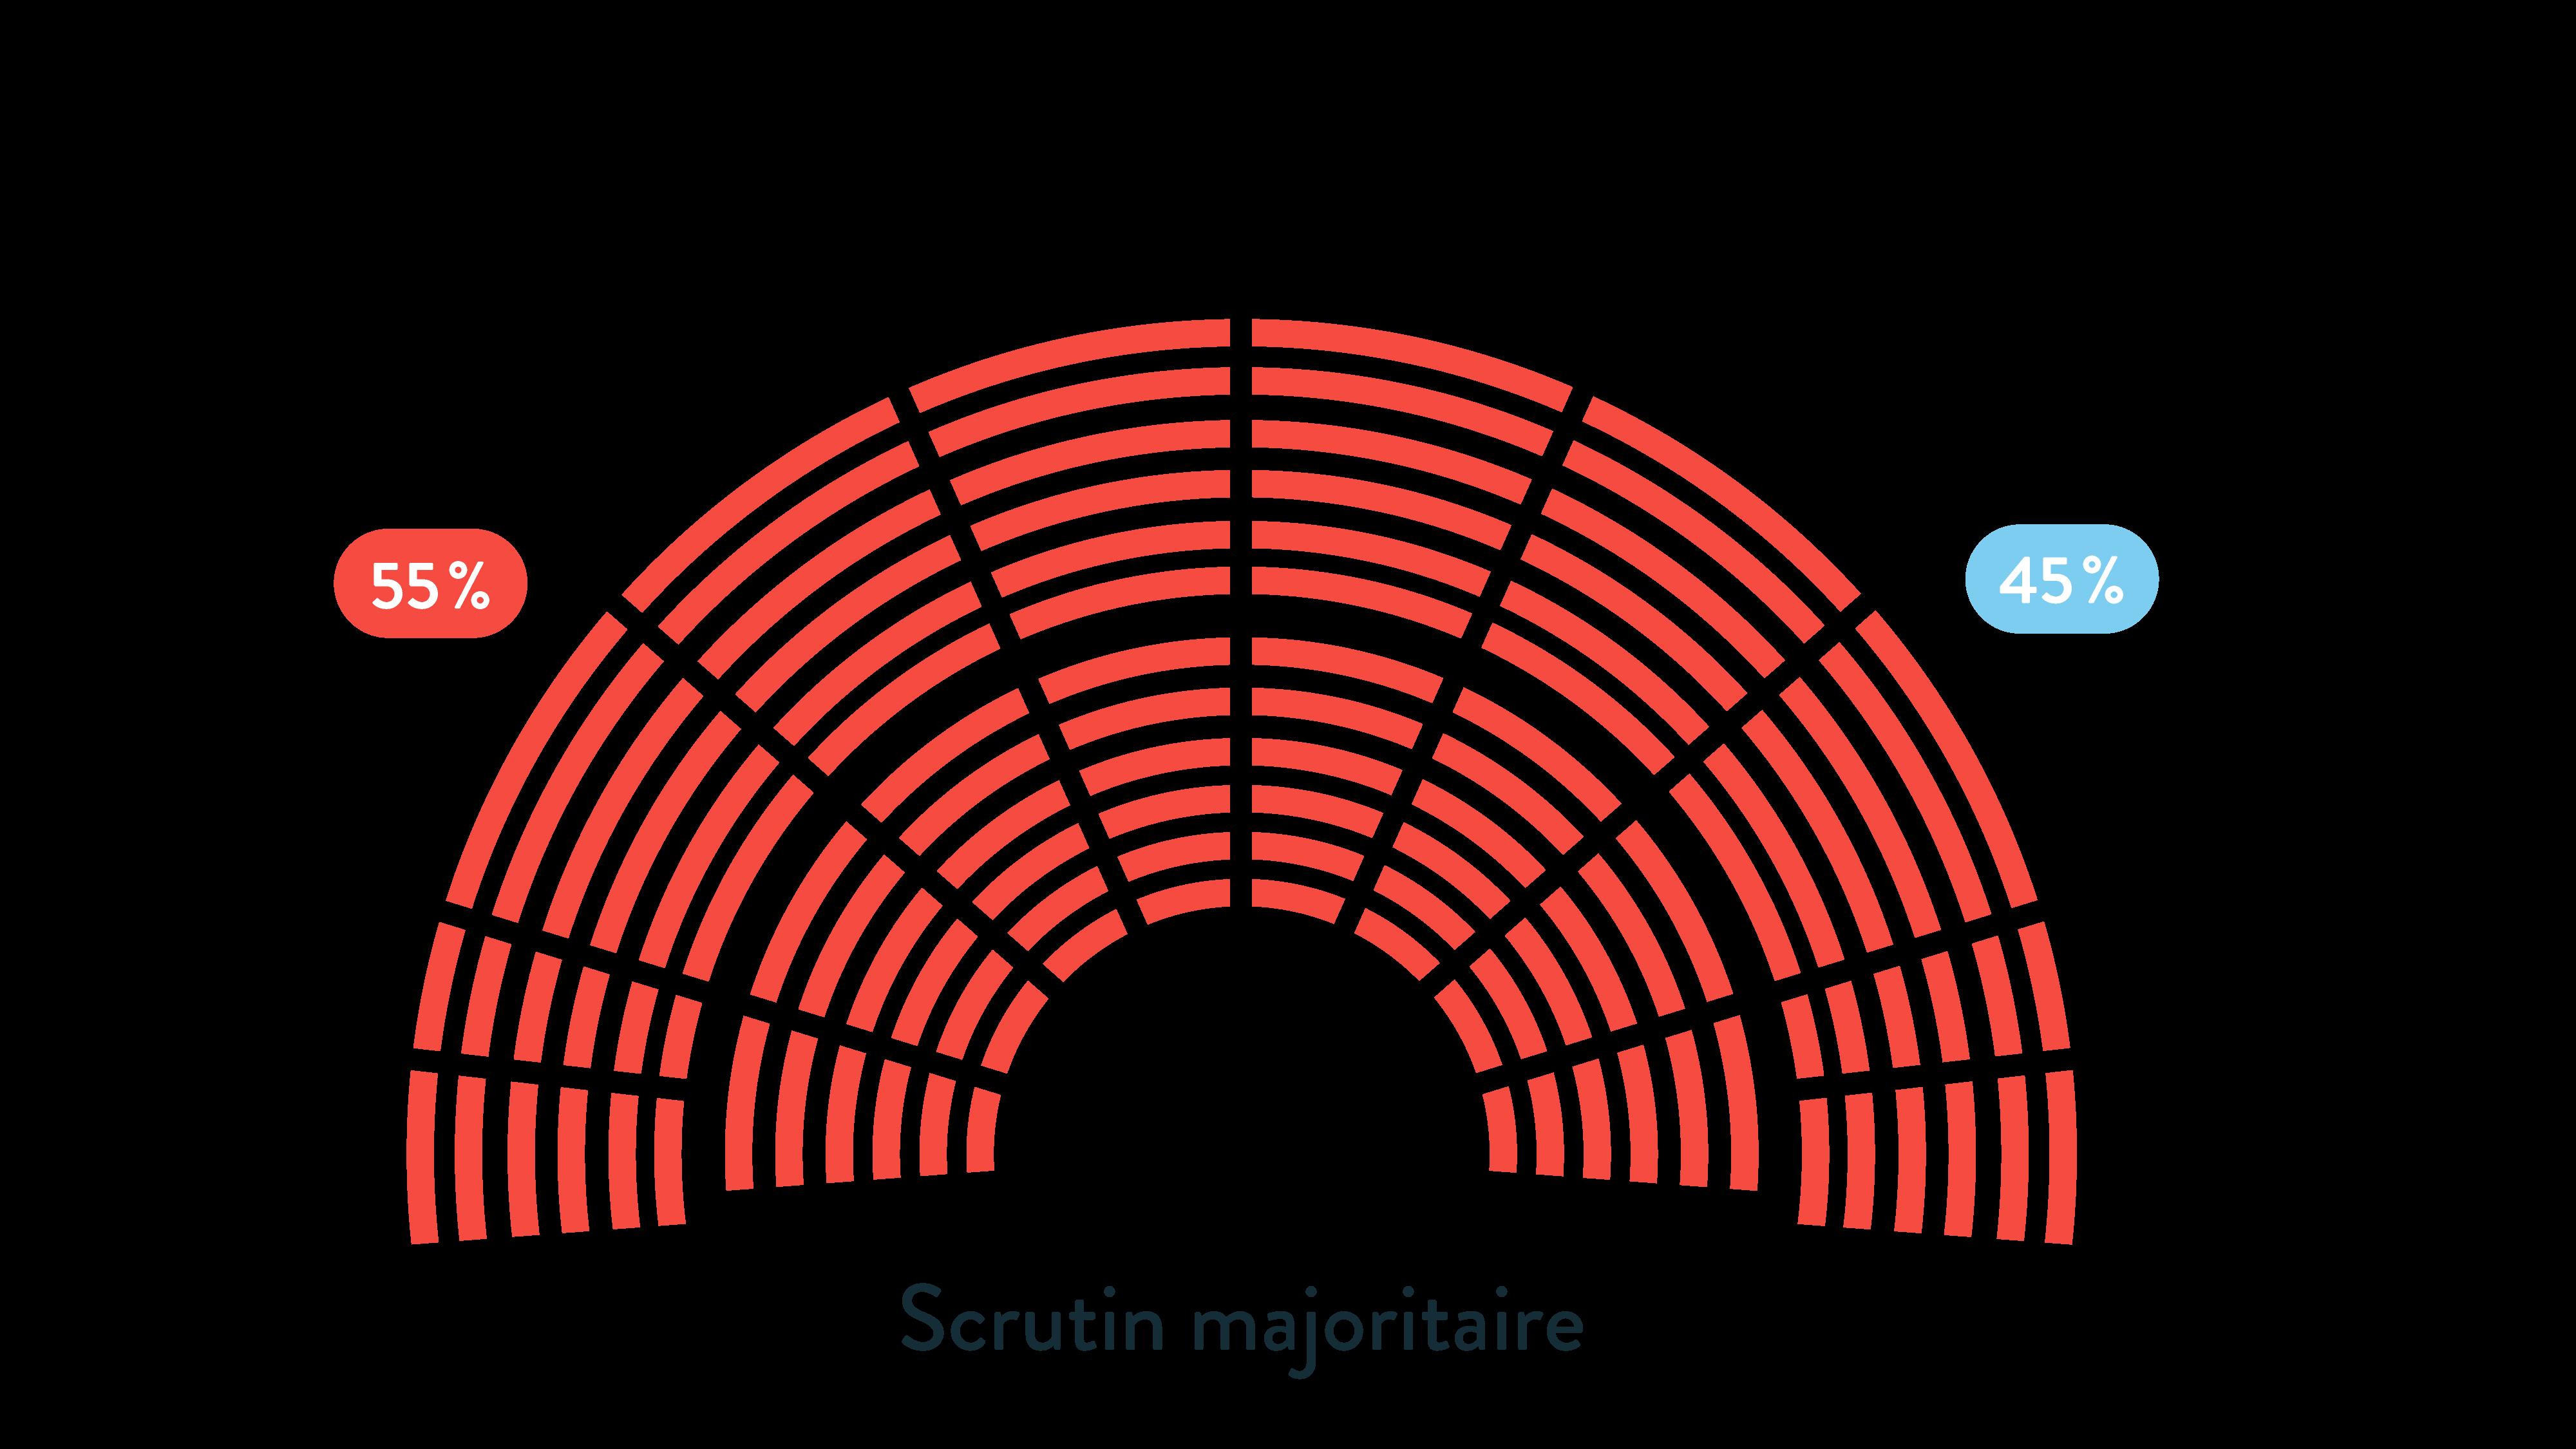 Le scrutin majoritaire ses terminale